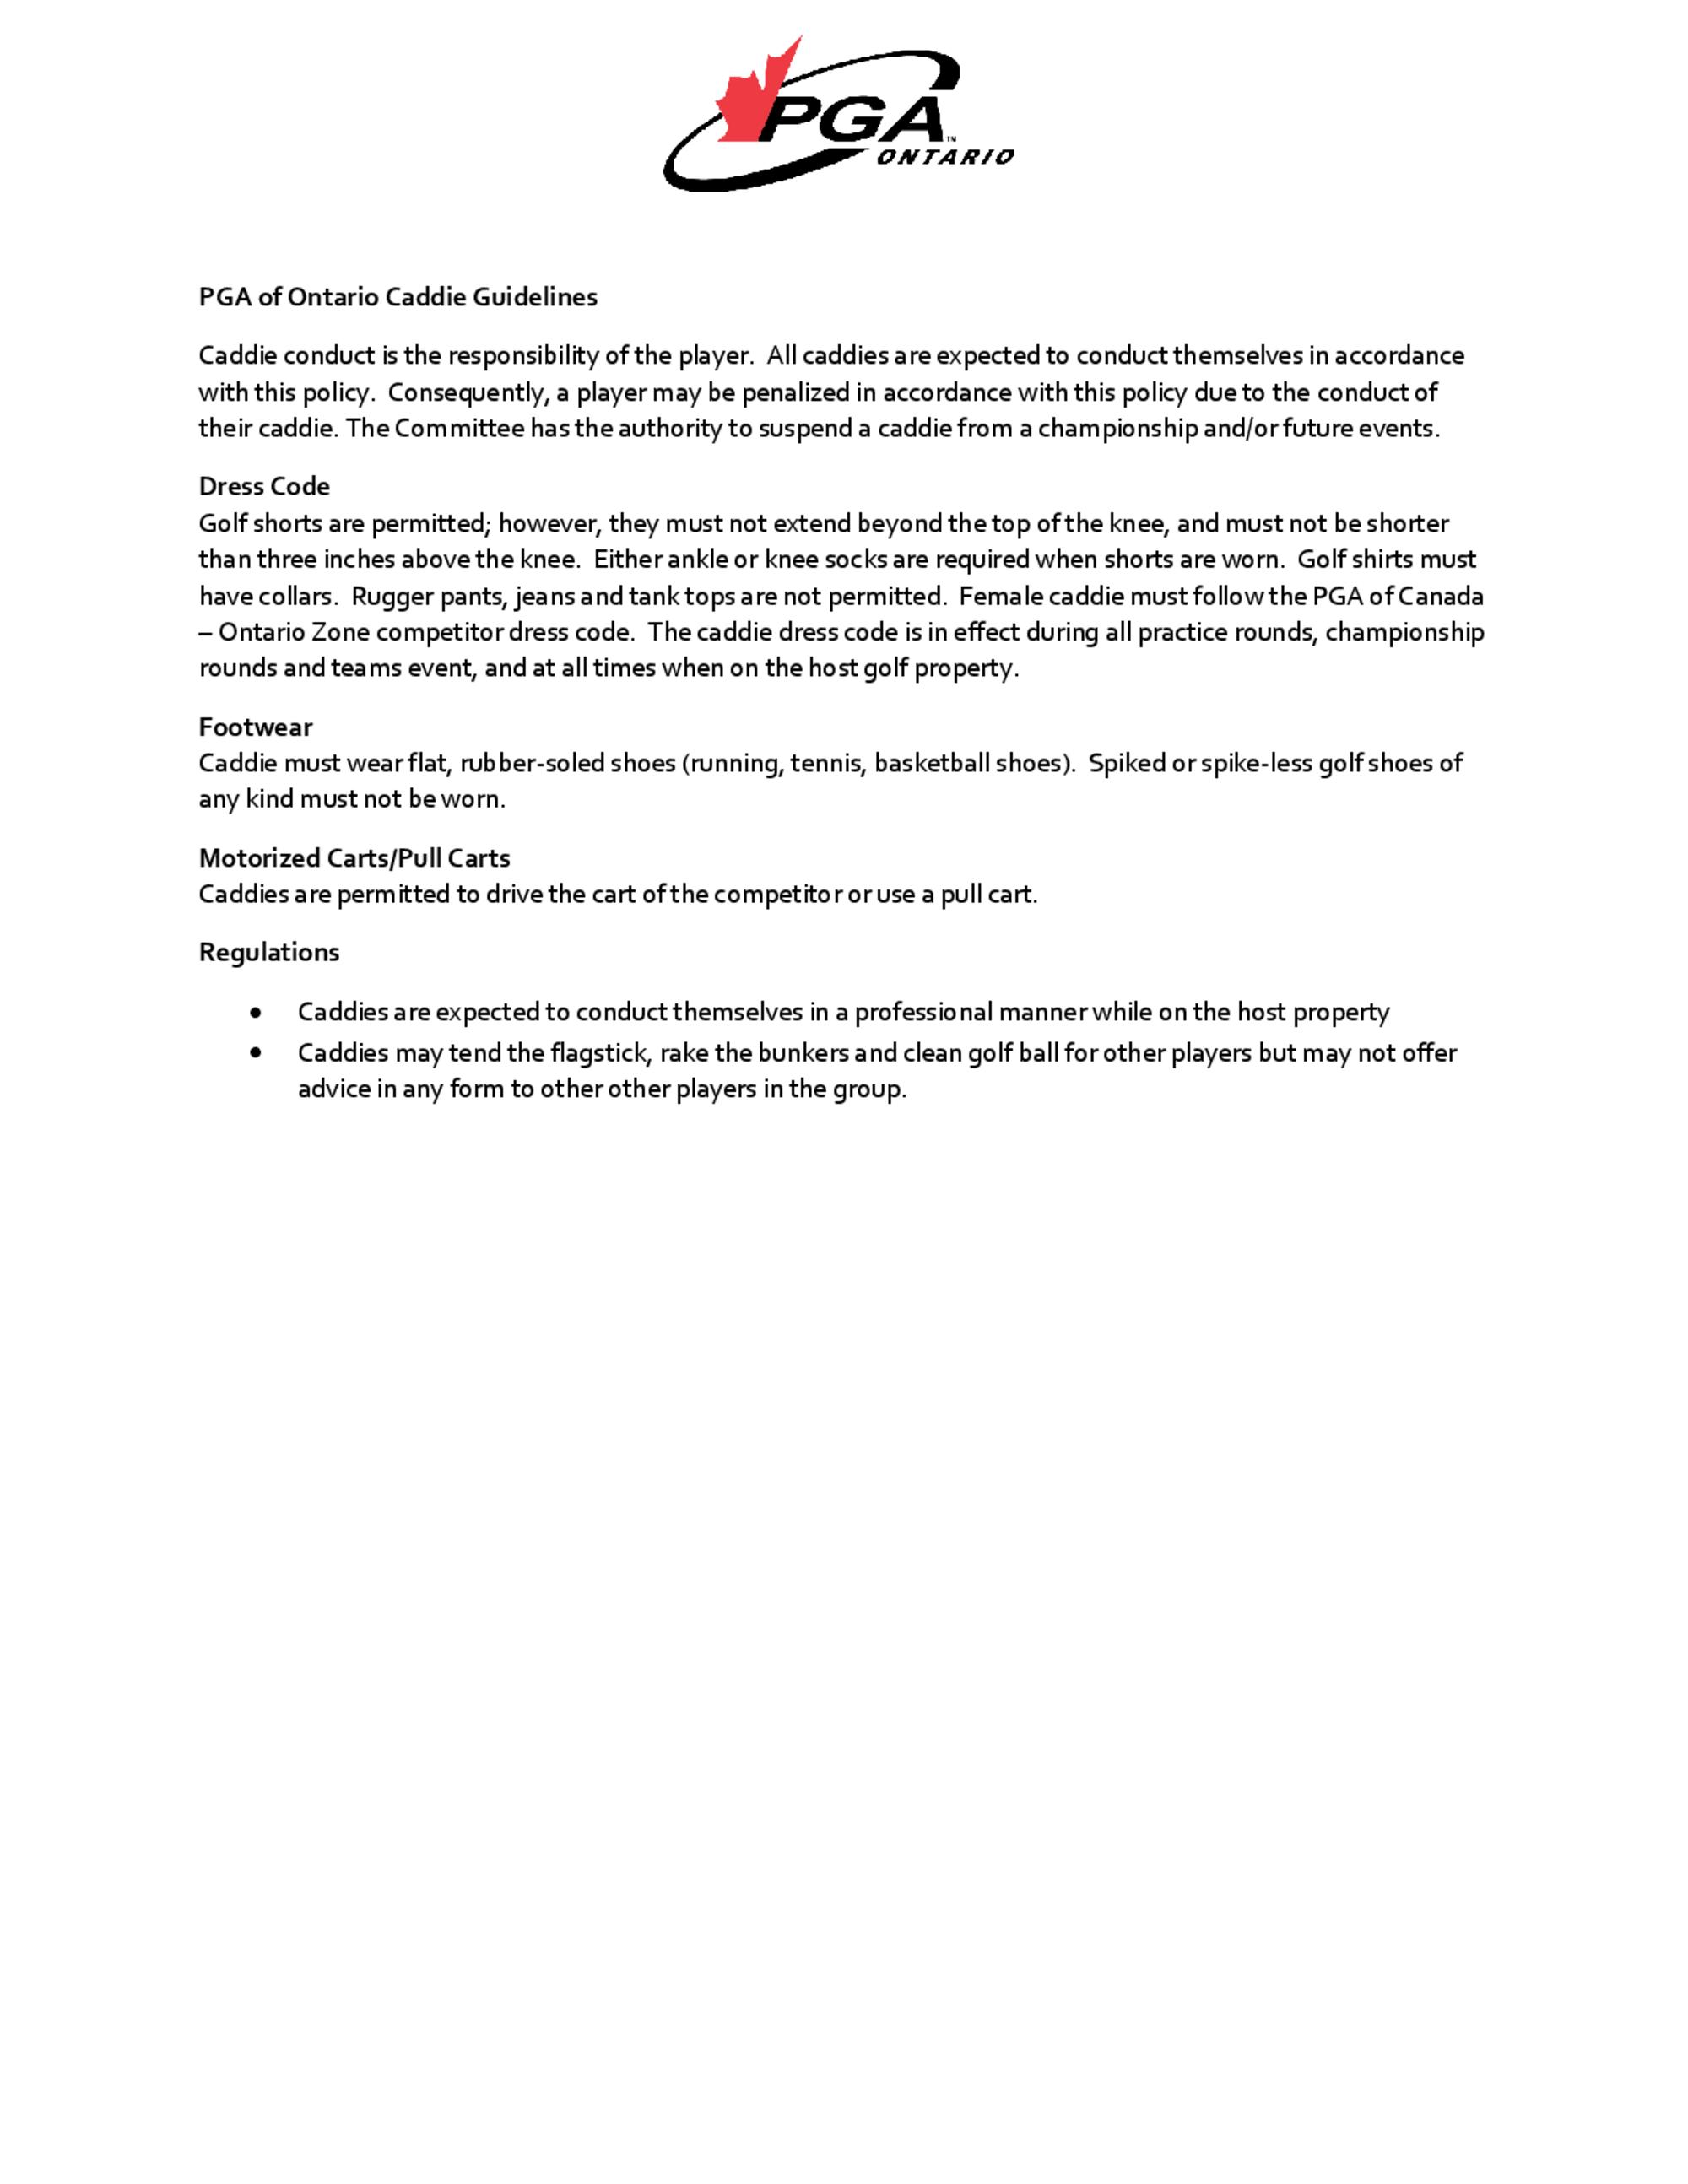 Ontario   caddie guidelines v1 1